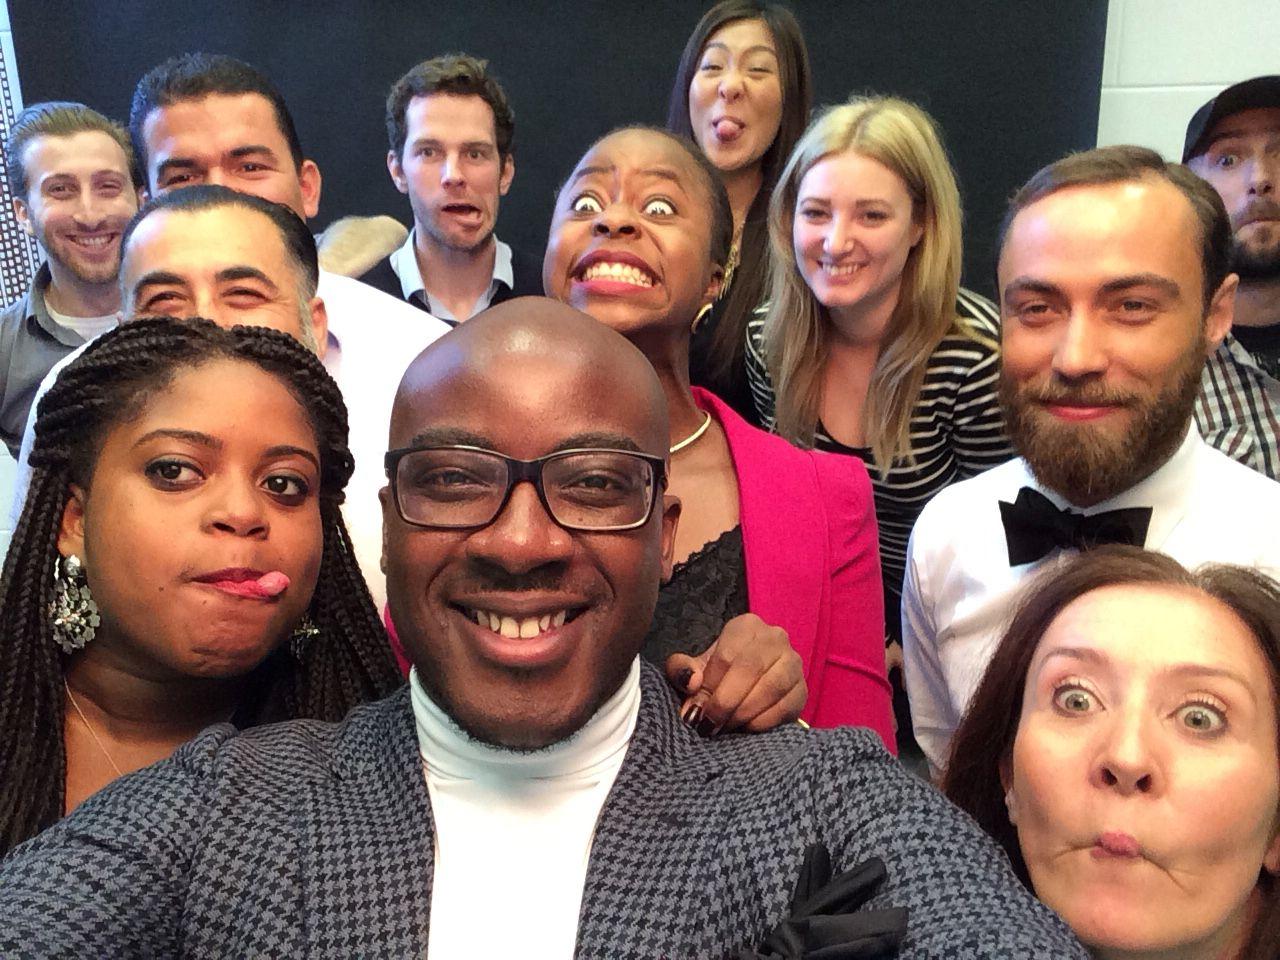 Fun selfie after the James Middleton shoot